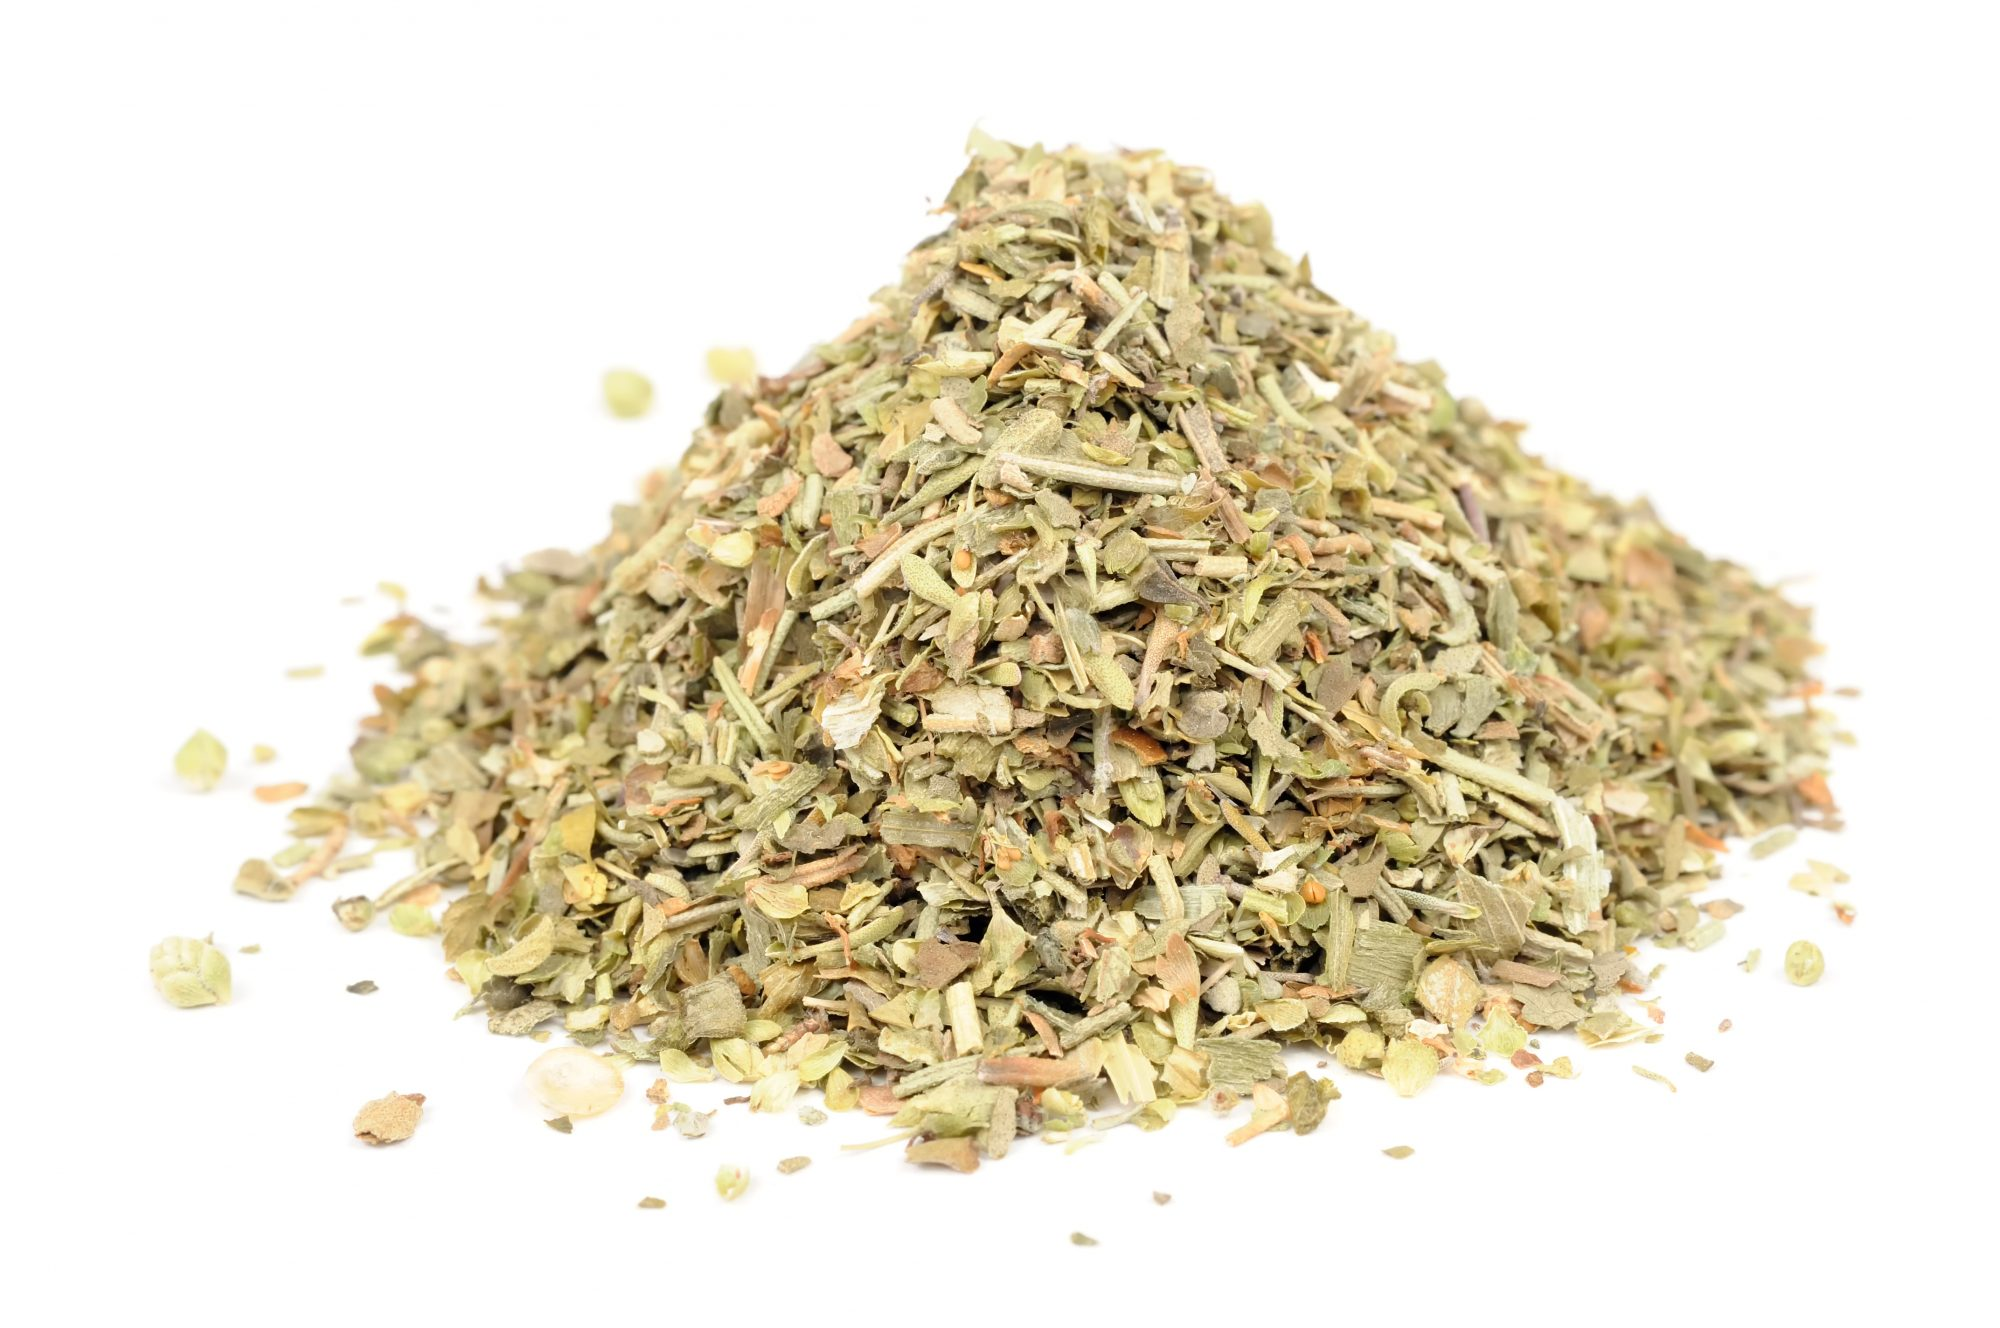 getty-herbes-de-provence-image